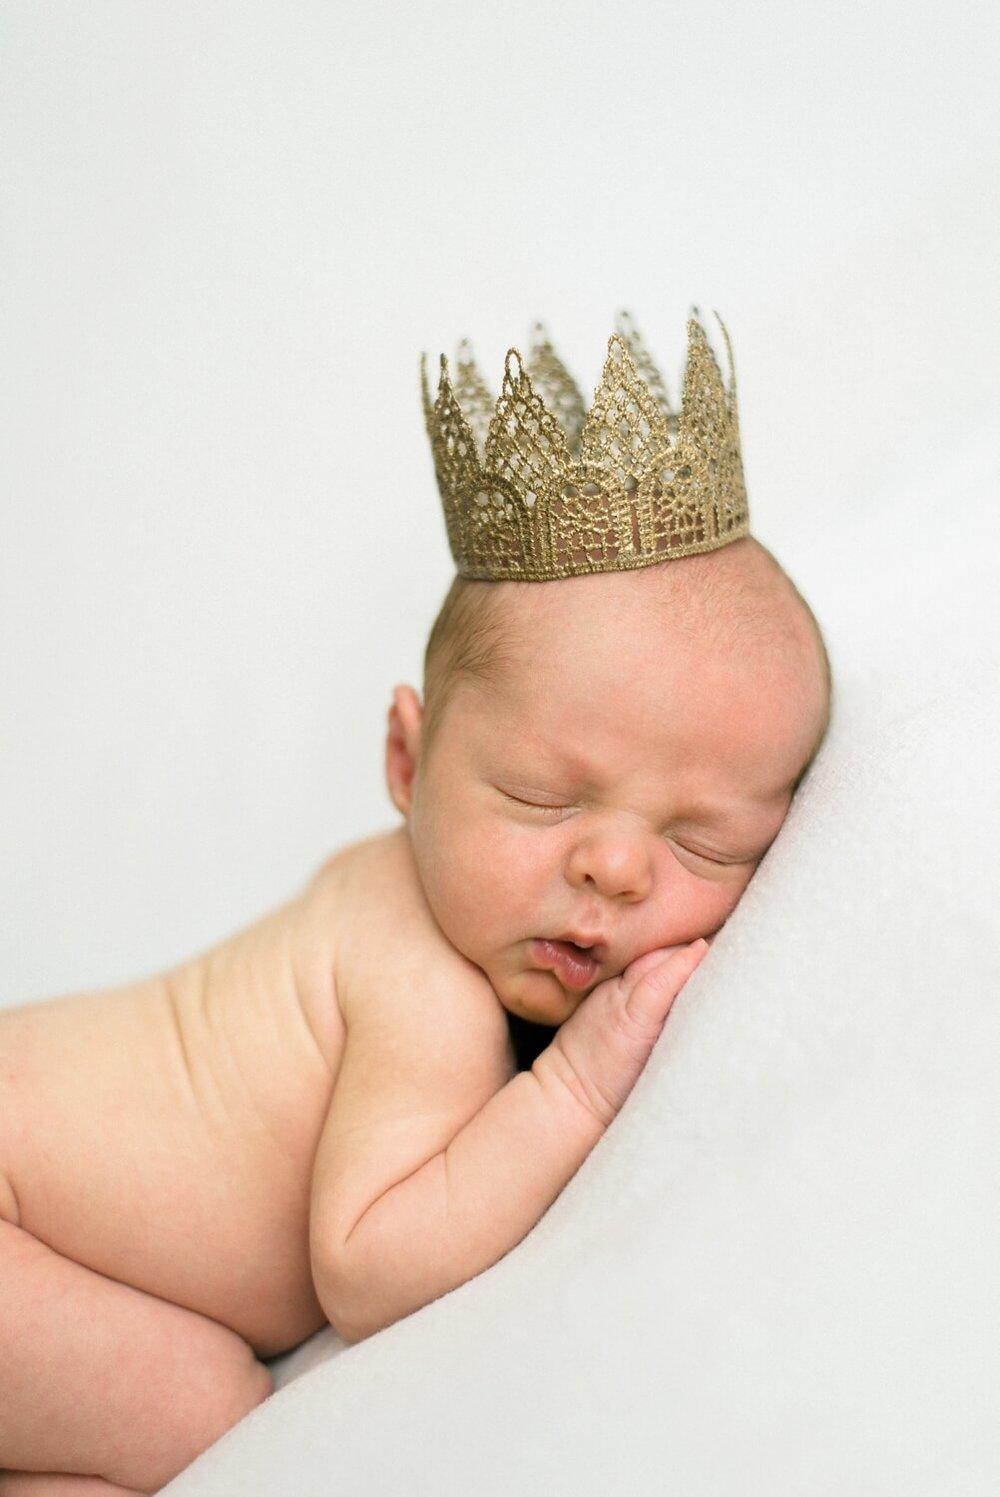 best-portland-oregon-newborn-photographer-sleeping-baby-boy-in-crown-shelley-marie-photography-43.jpg